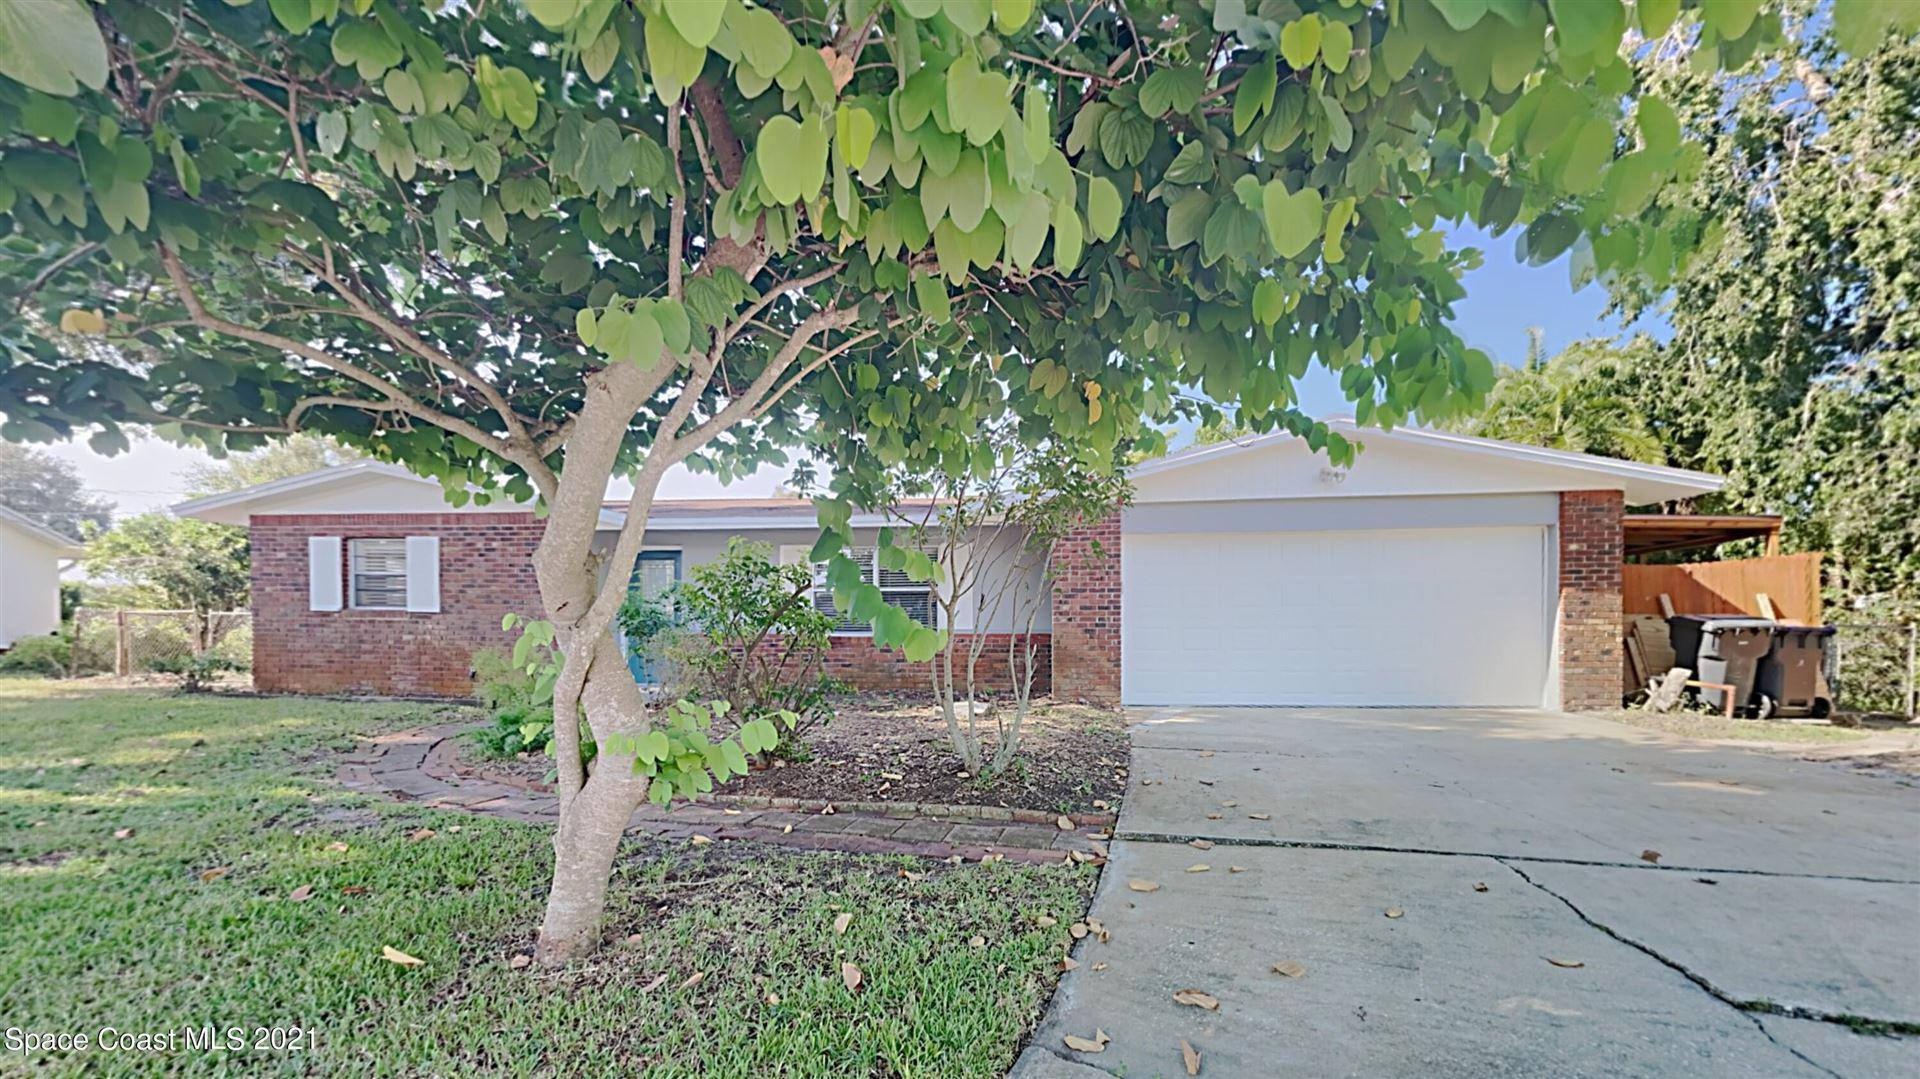 2351 Middlecoff Court, Titusville, FL 32780 - #: 913850